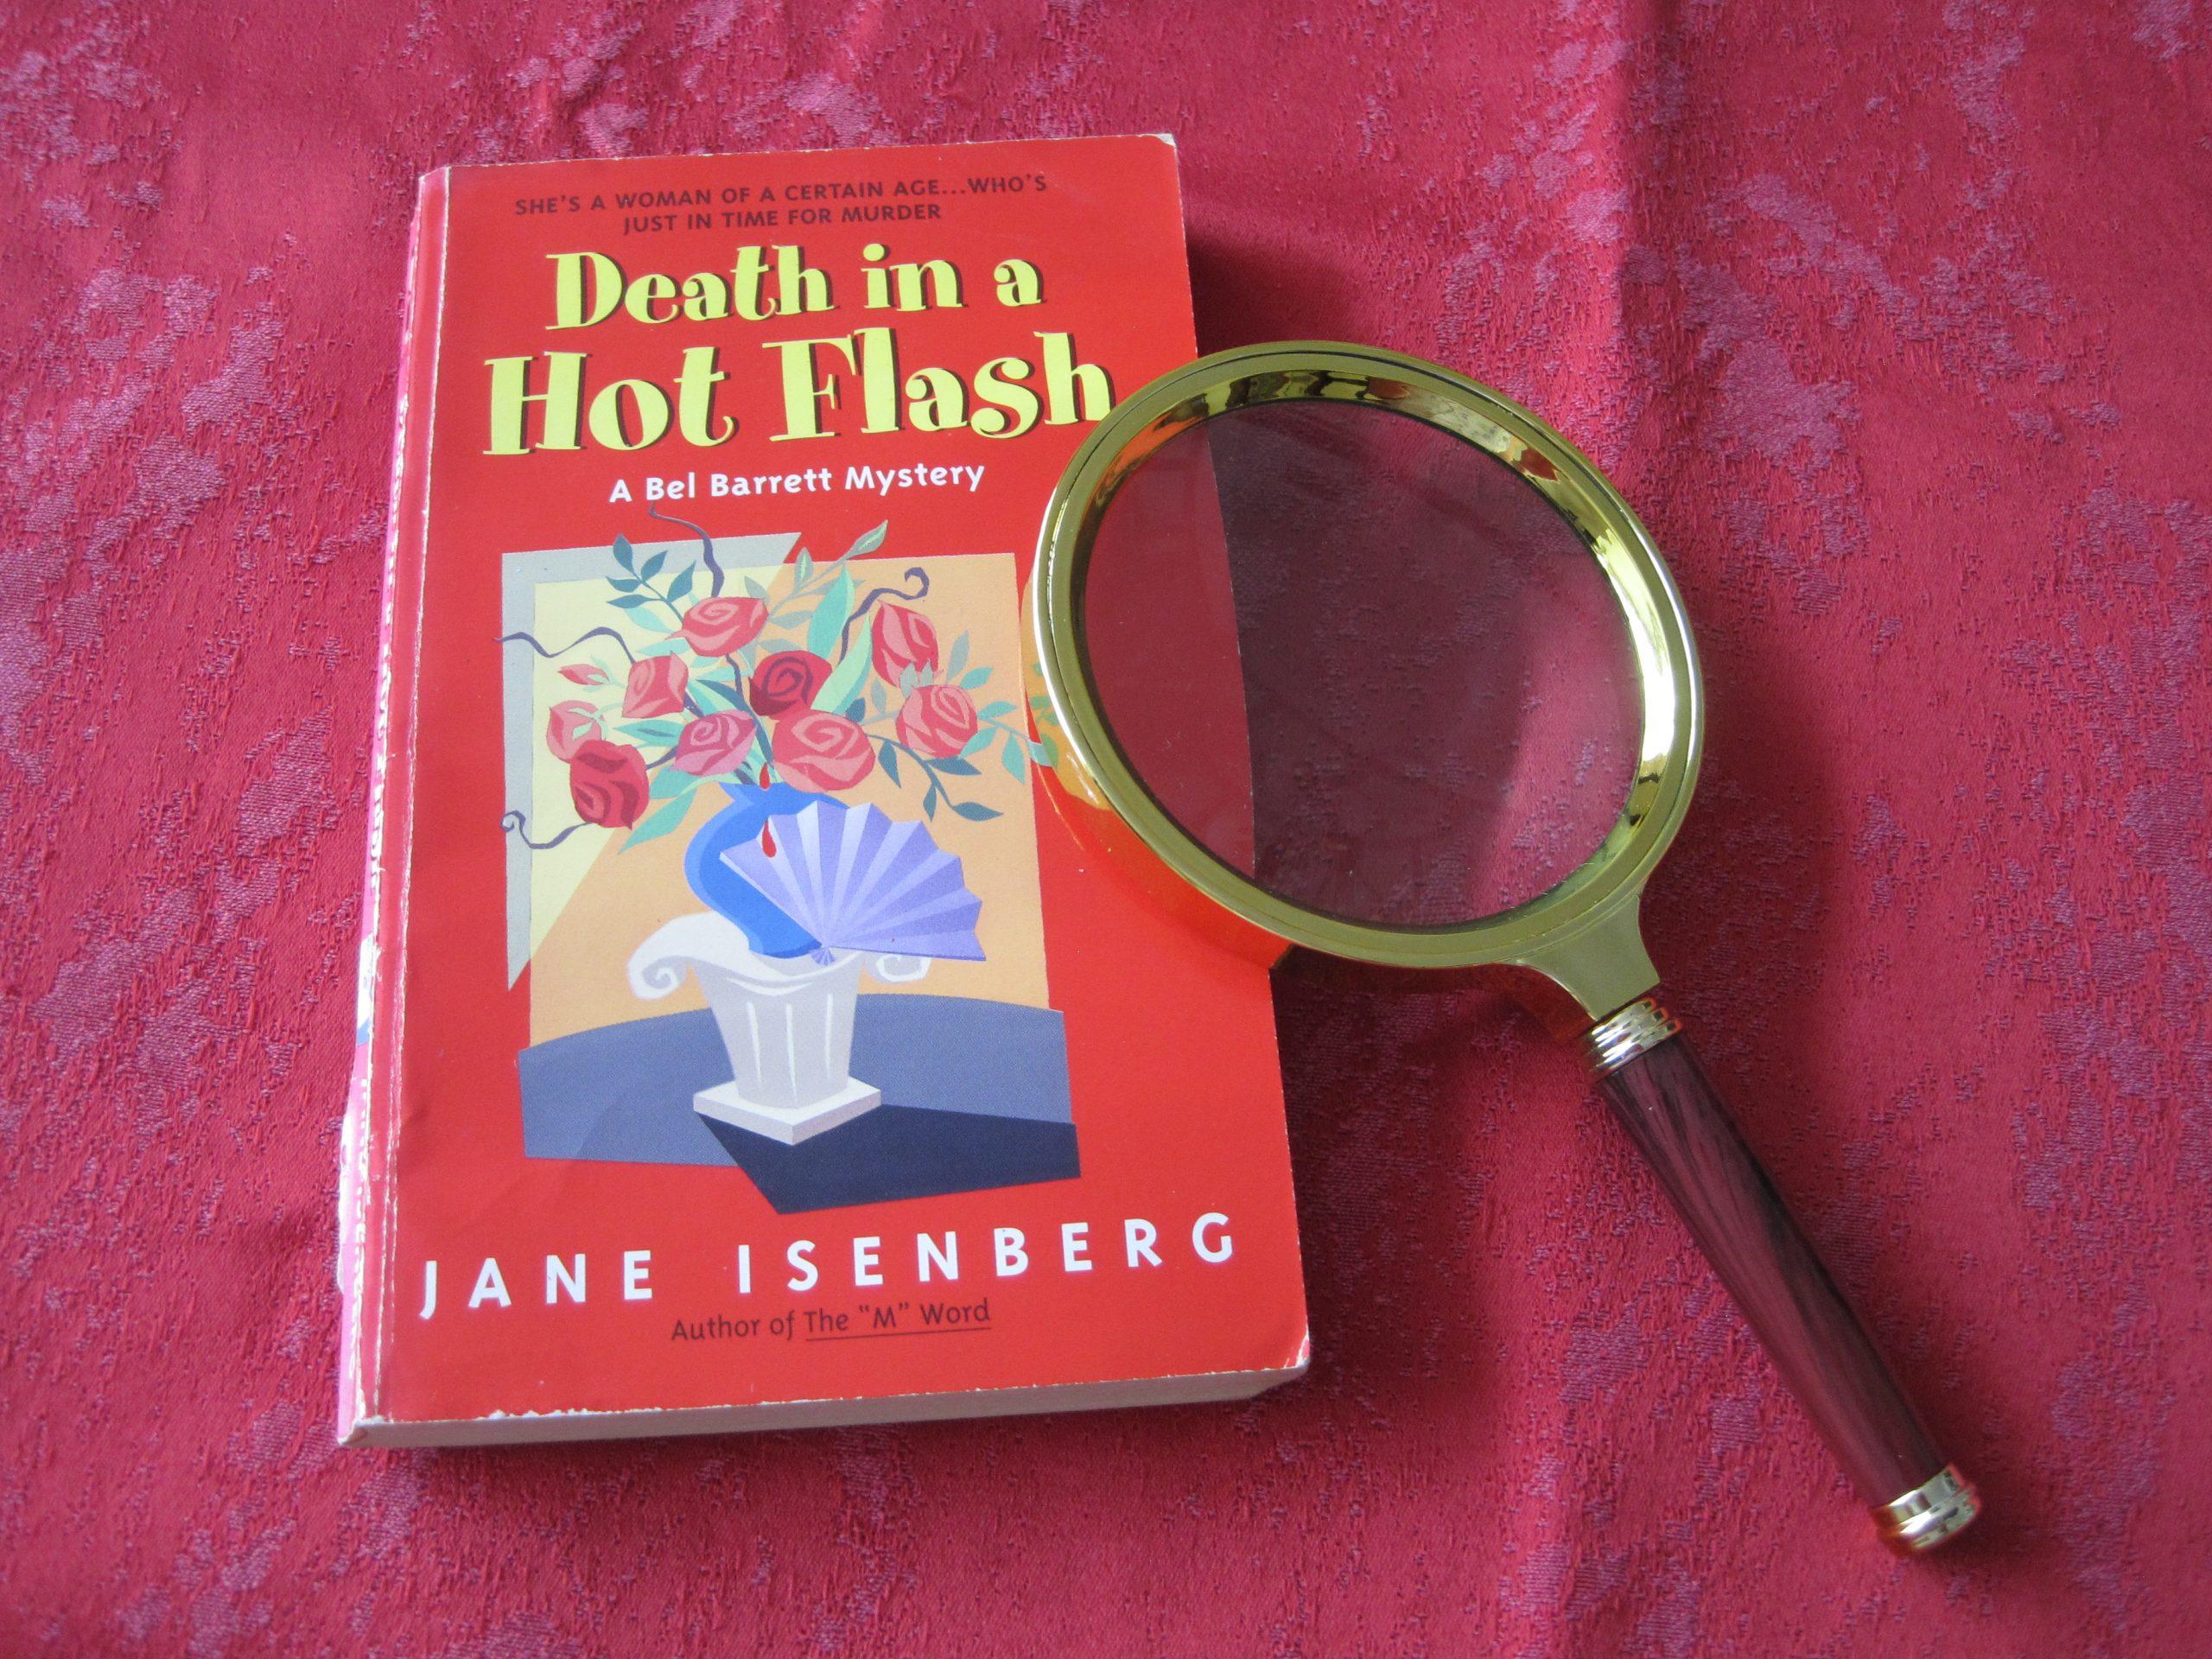 Death in a Hot Flash - photo by Juliamaud